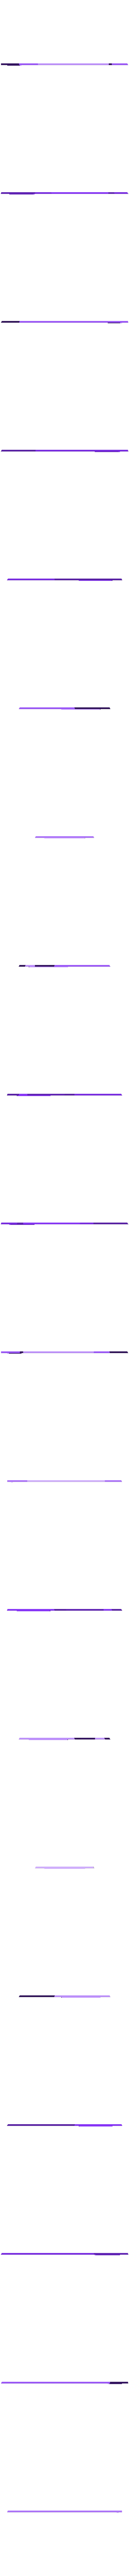 Coperchio.stl Download free STL file Mosfet Box for 2020 / 2040 Aluminum Profiles • 3D printing design, Kliffom